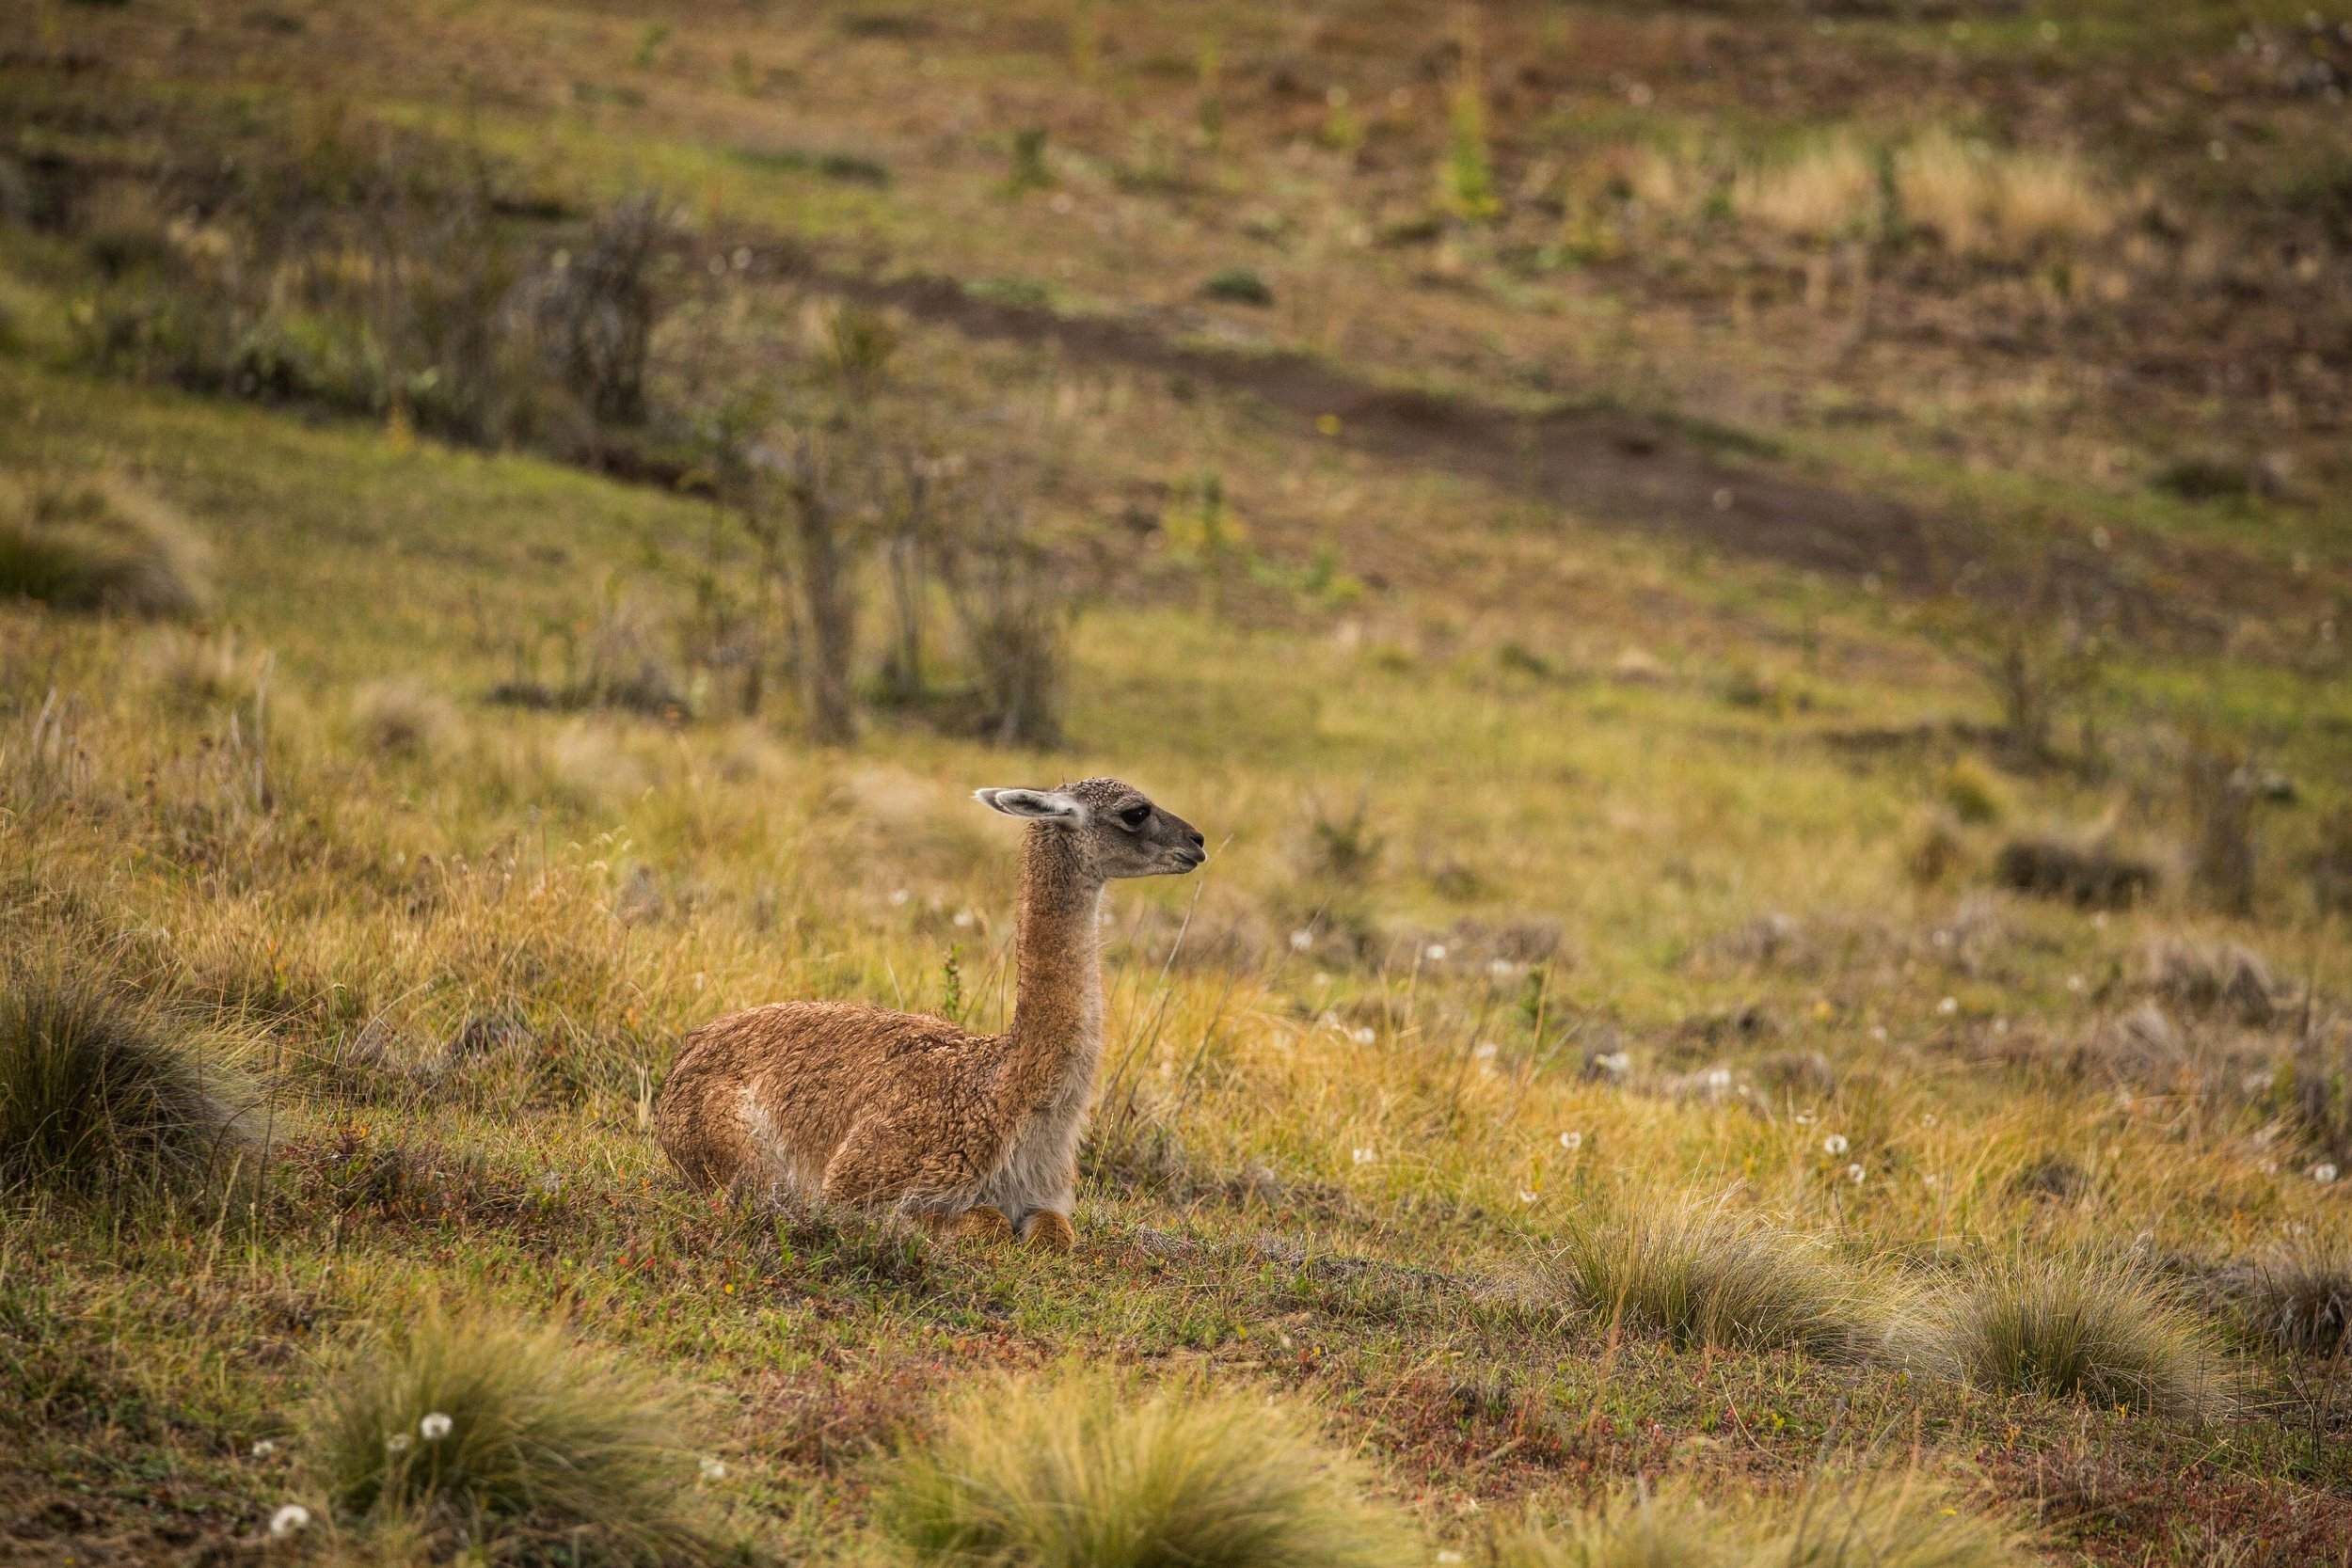 Young guanaco taking a break from grazing